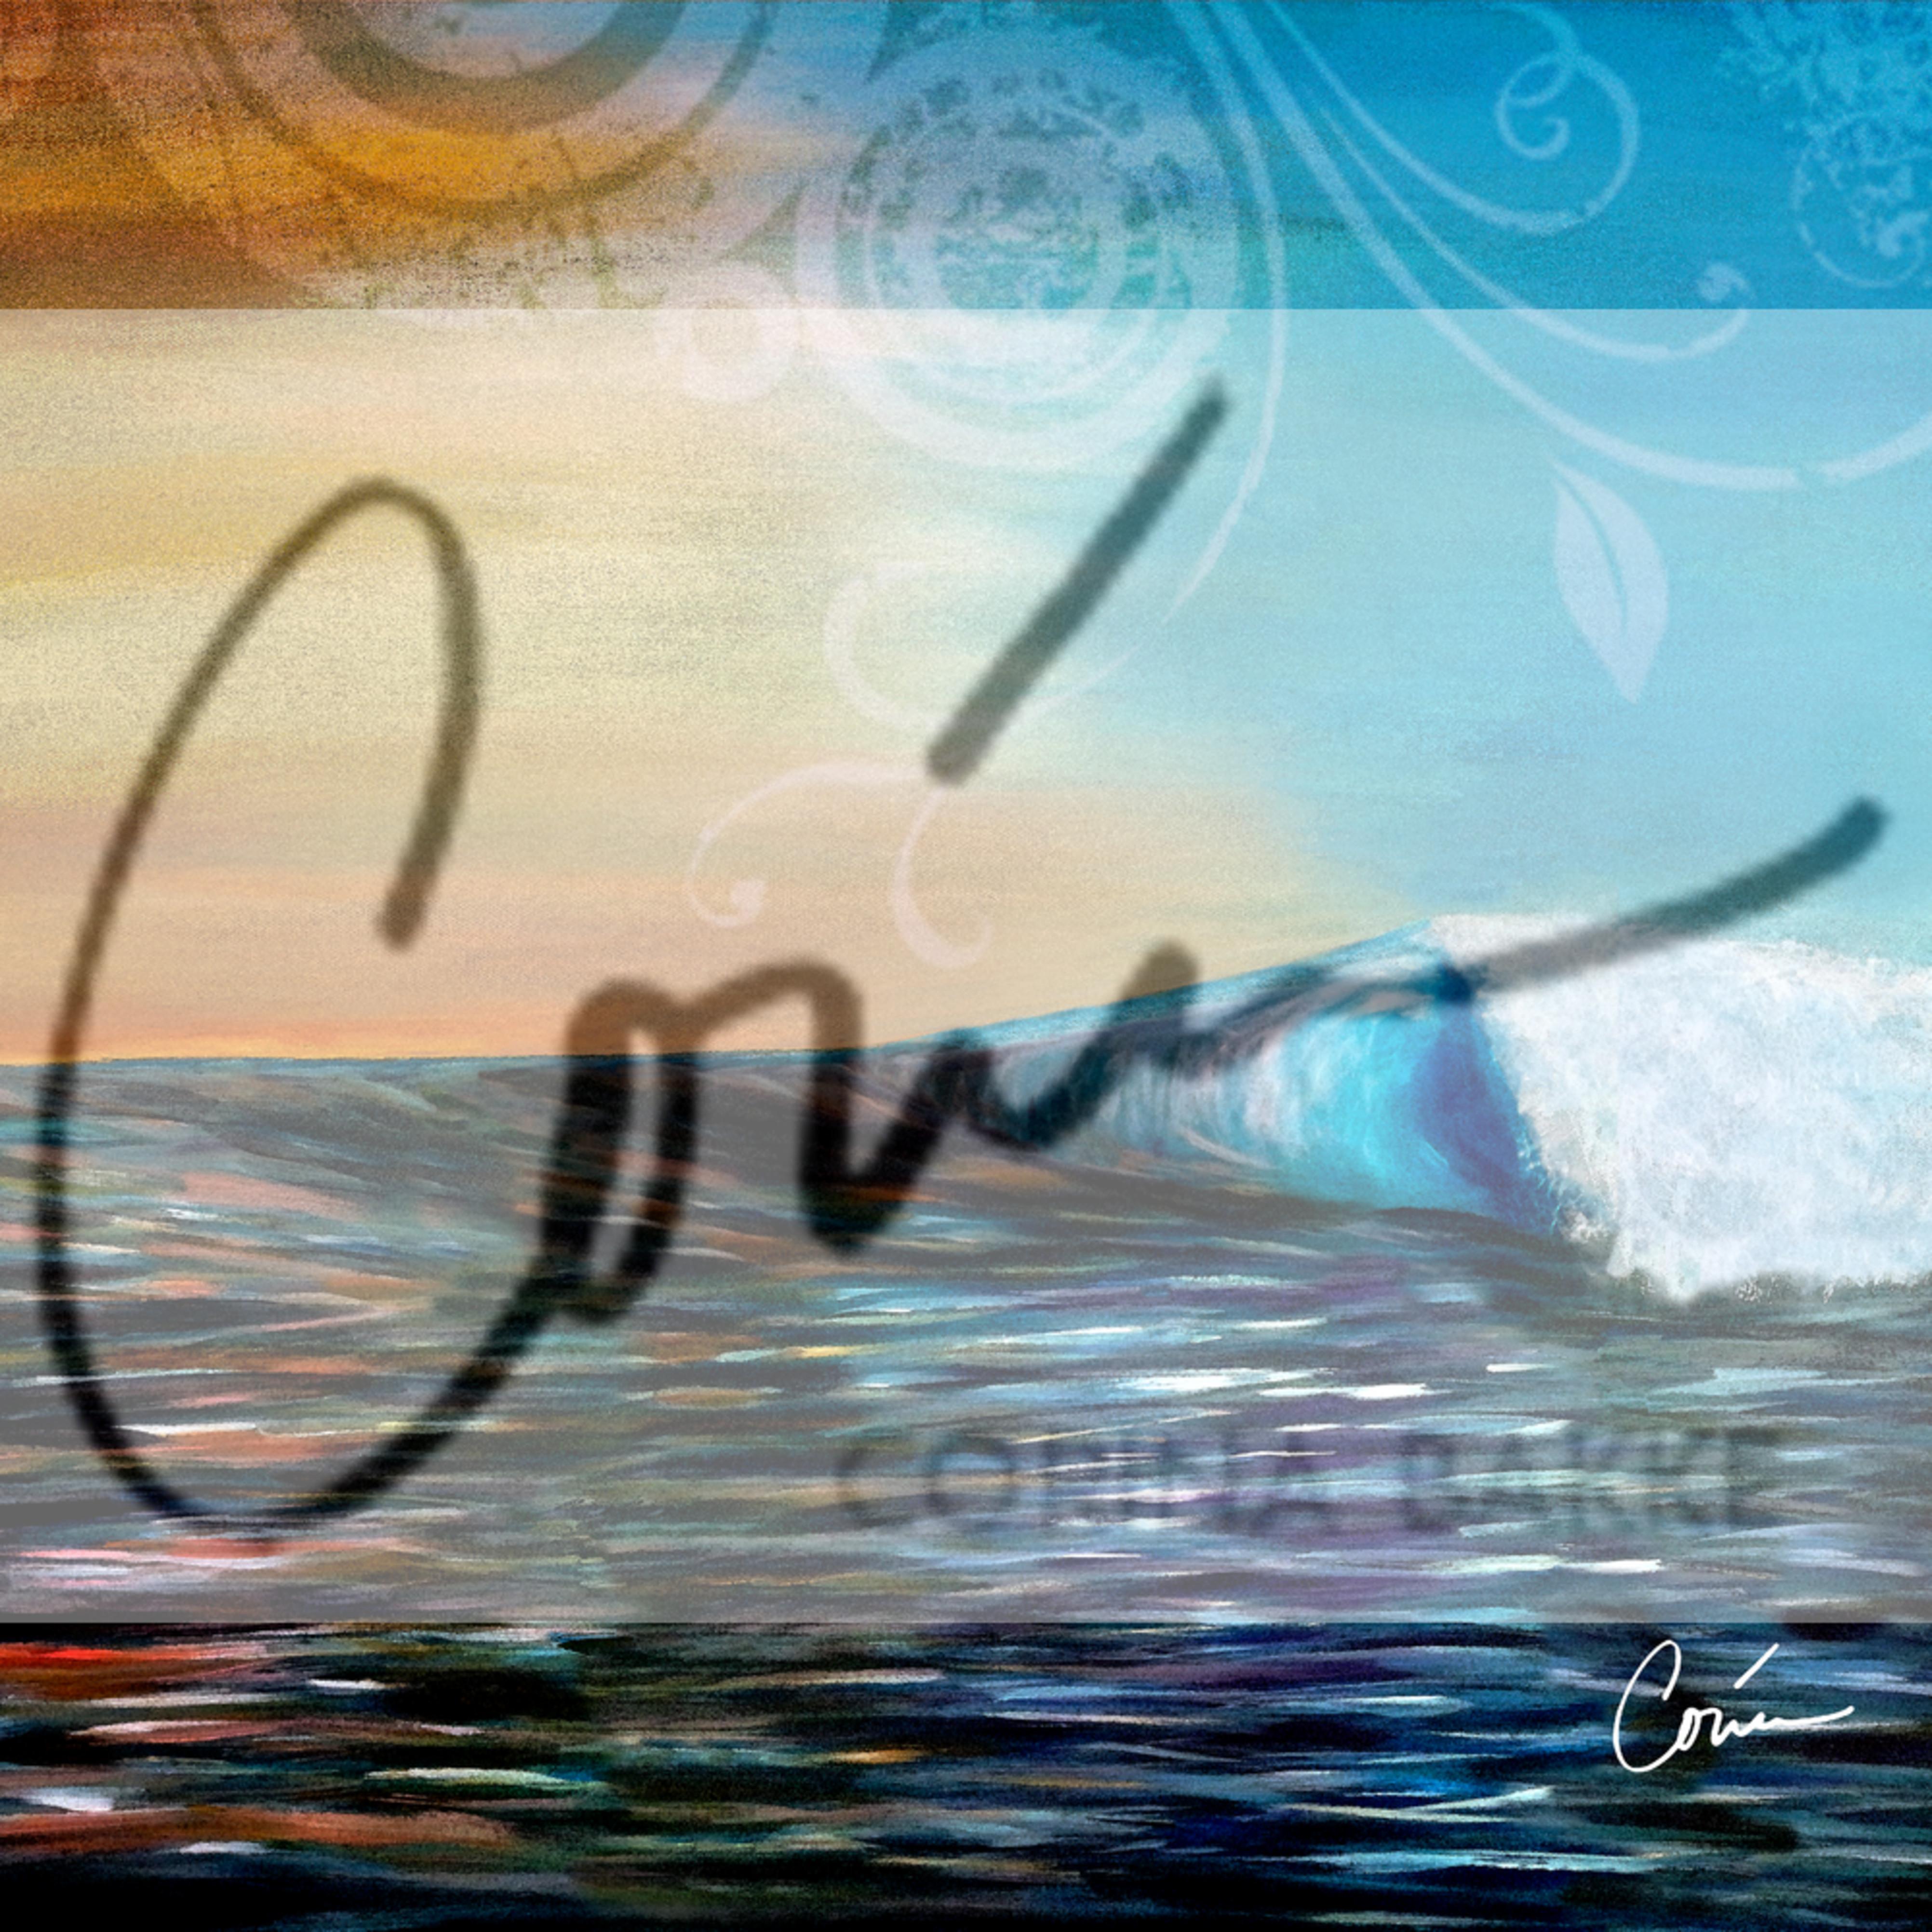 Maui wave august iomnvz